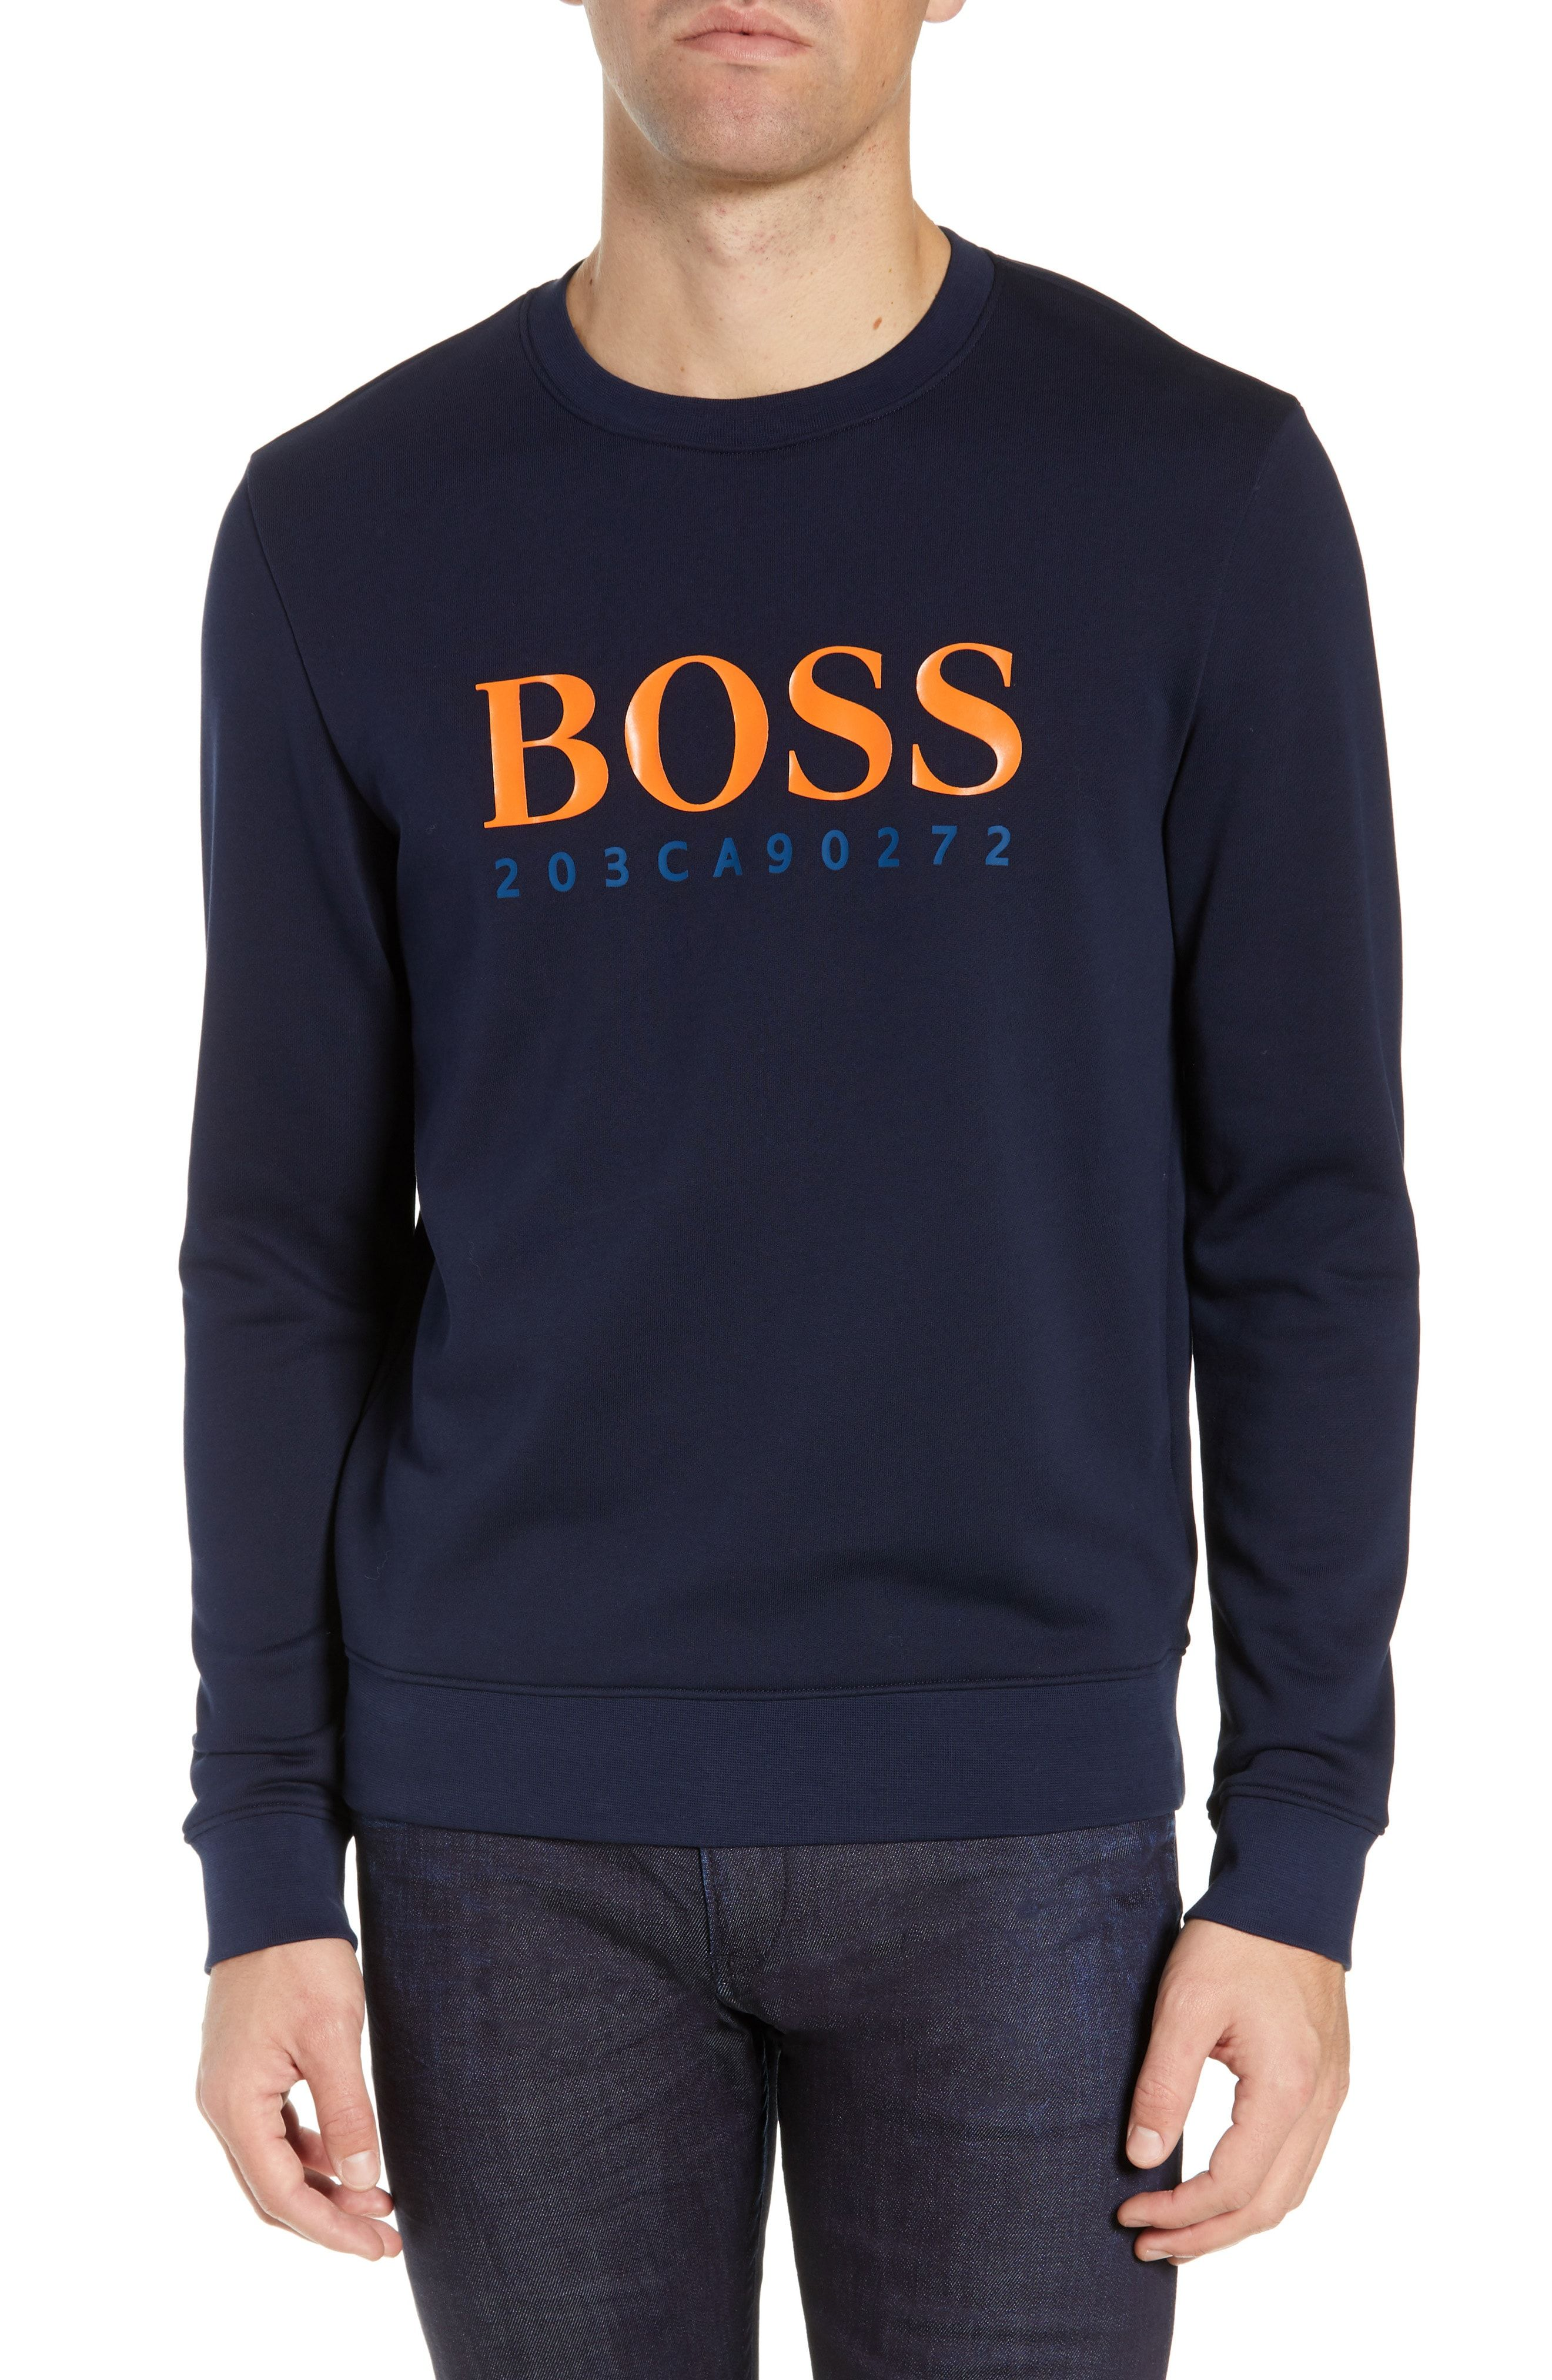 75256664f BOSS STADLER 19 CREWNECK SWEATSHIRT. #boss #cloth | Boss in 2019 ...